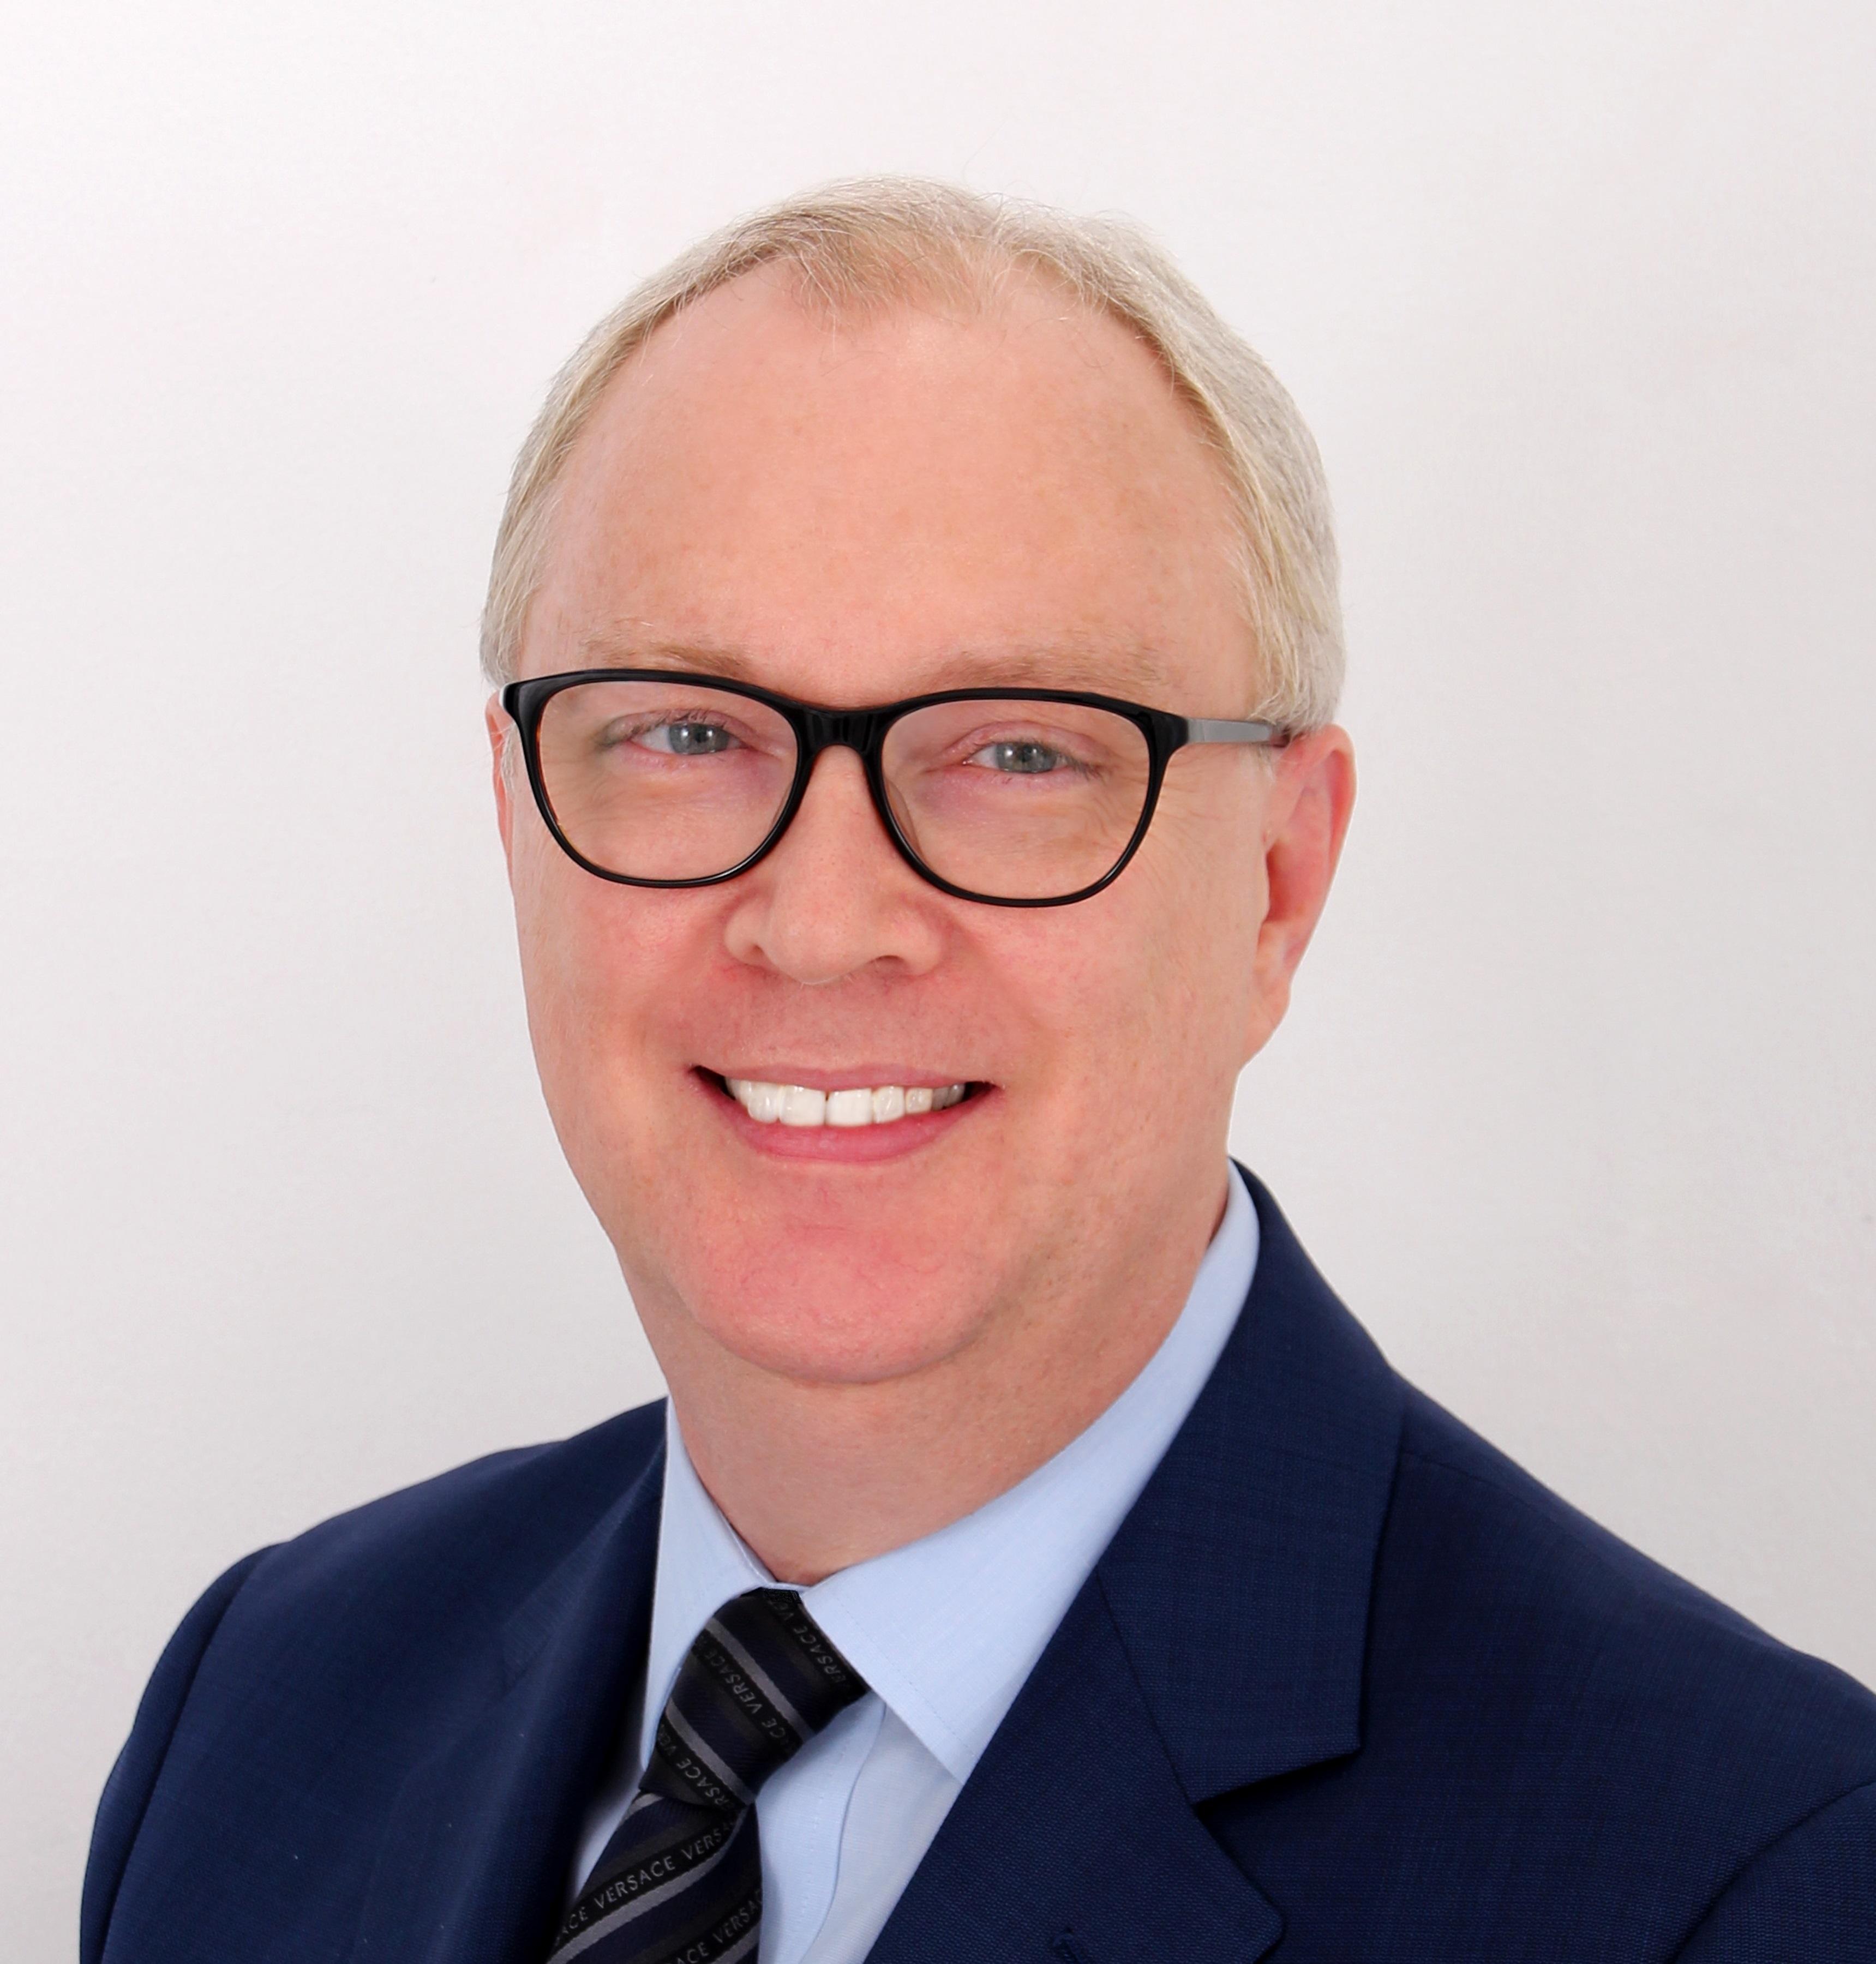 Mark Lindley, MCIPD